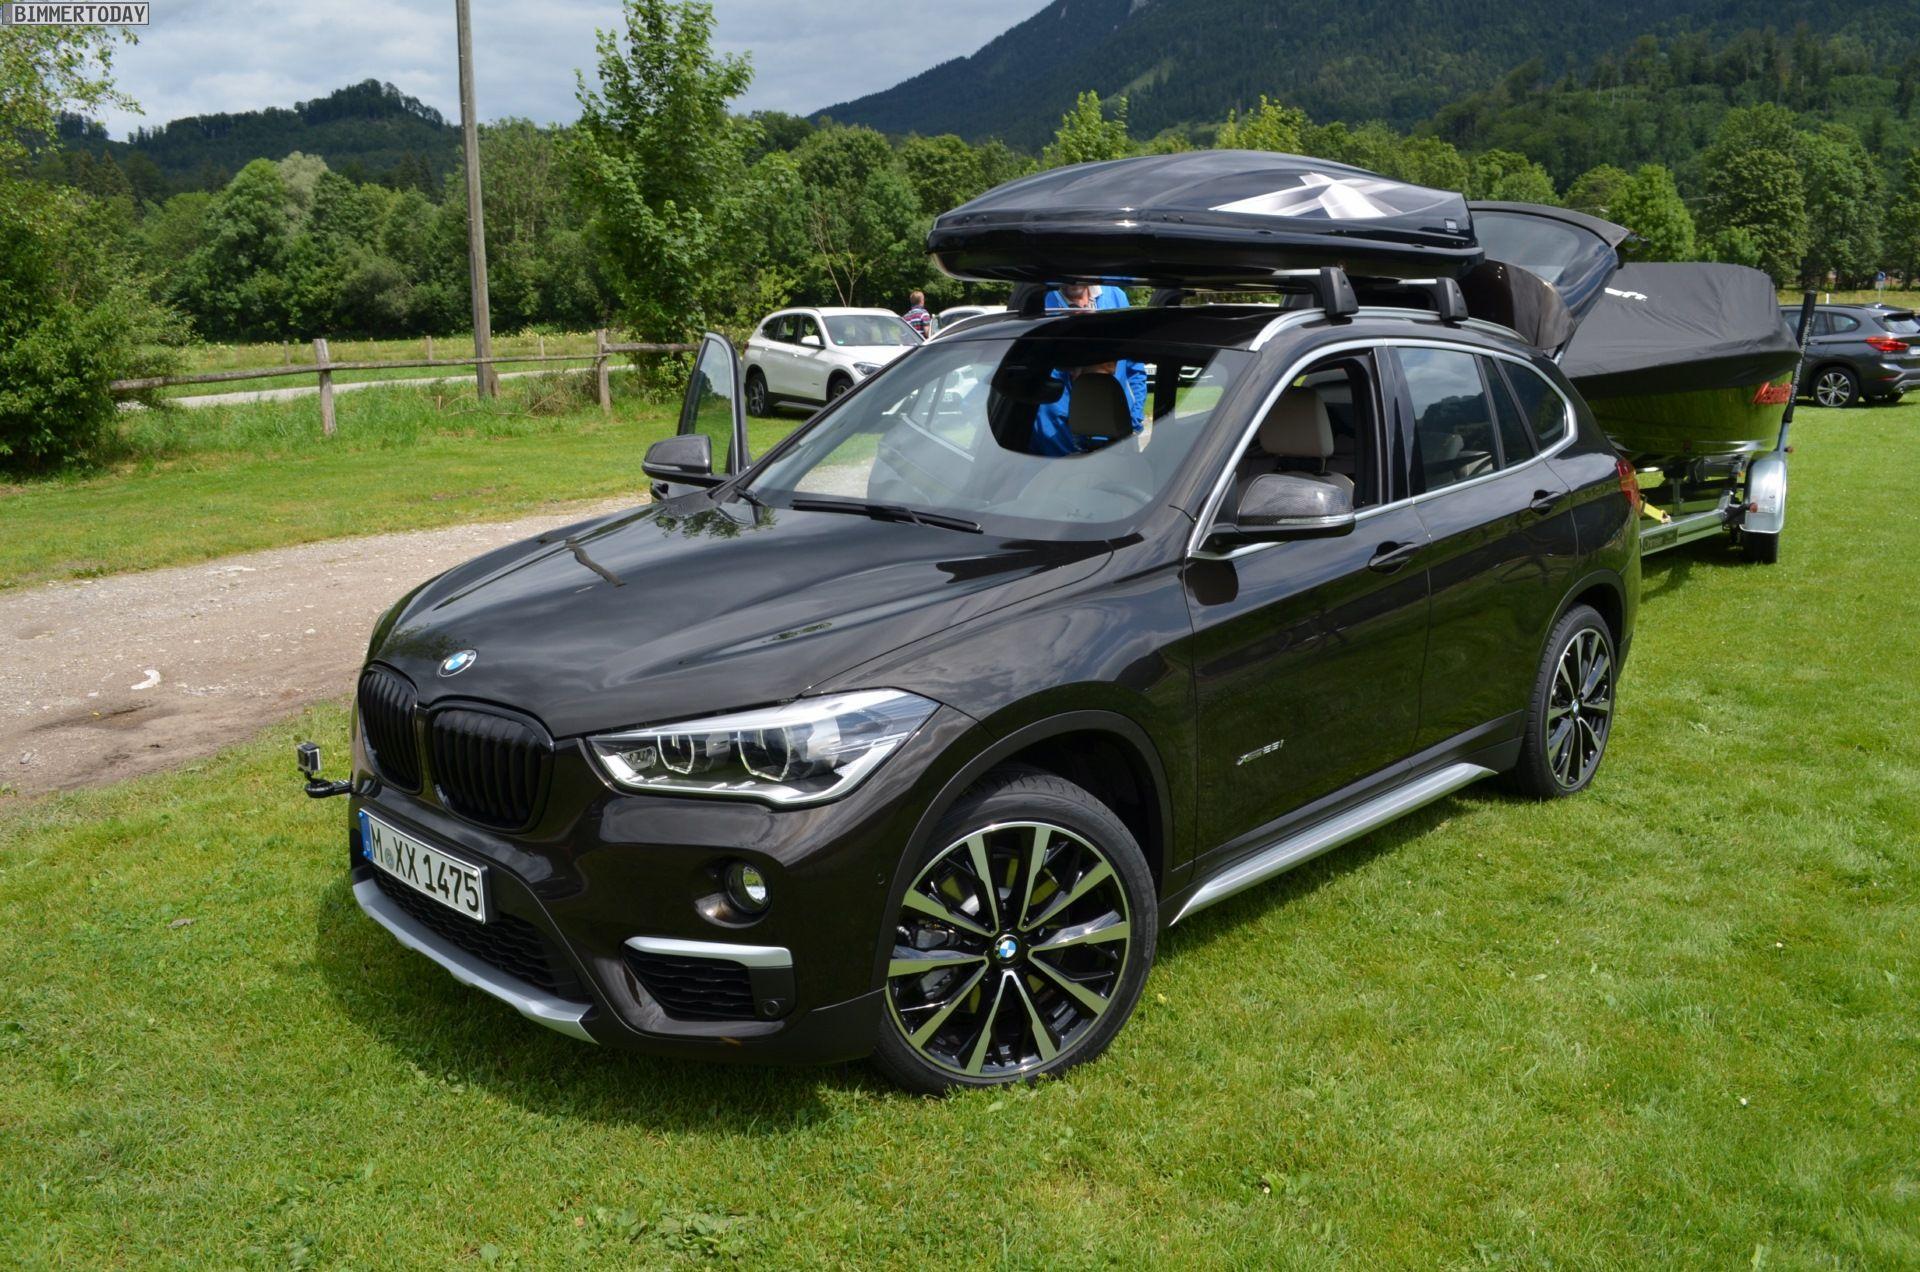 2015-BMW-X1-F48-Sparkling-Brown-Zubehoer-12 | Cars I love ...